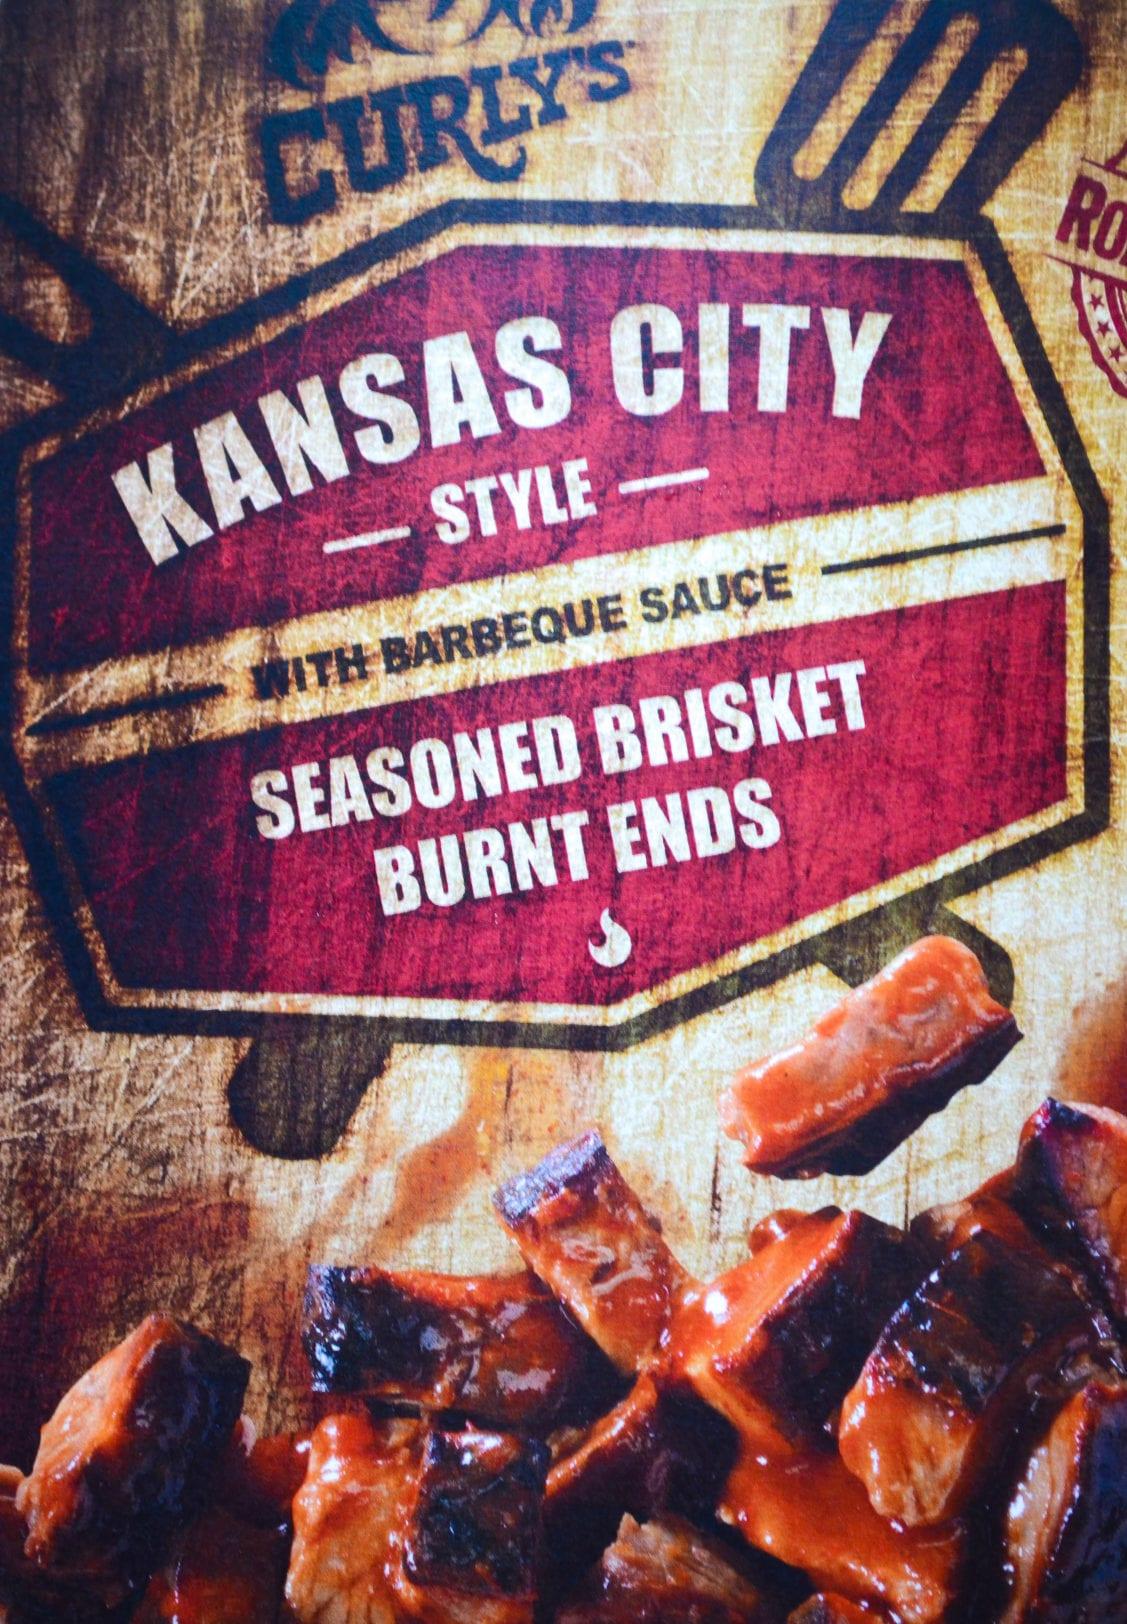 Kansas City Style BBQ Stuffed Peppers